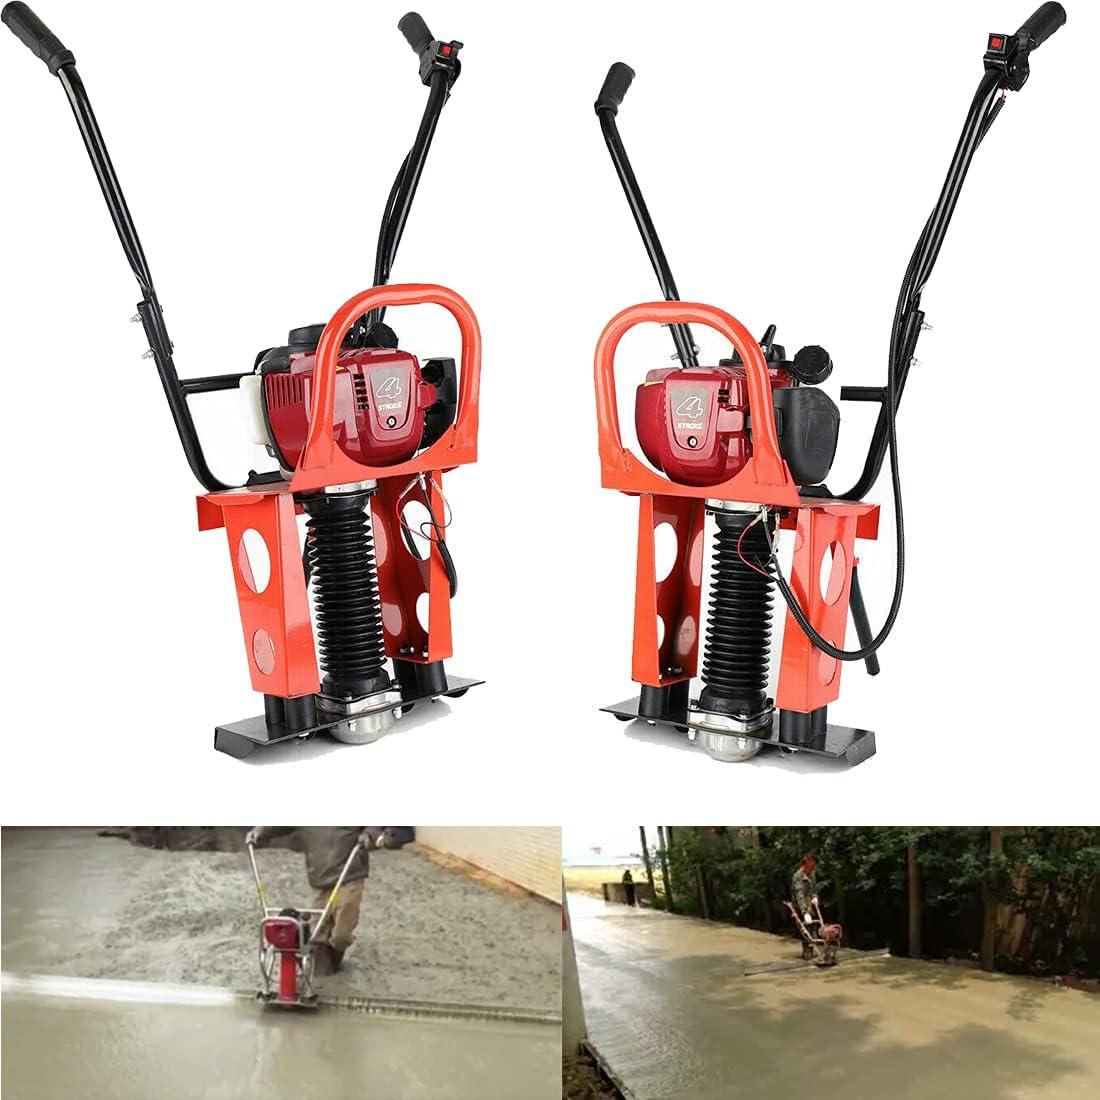 DNYSYSJ Sale item Gas Concrete Wet Popular standard Screed Stroke Power 37.7CC Com 4